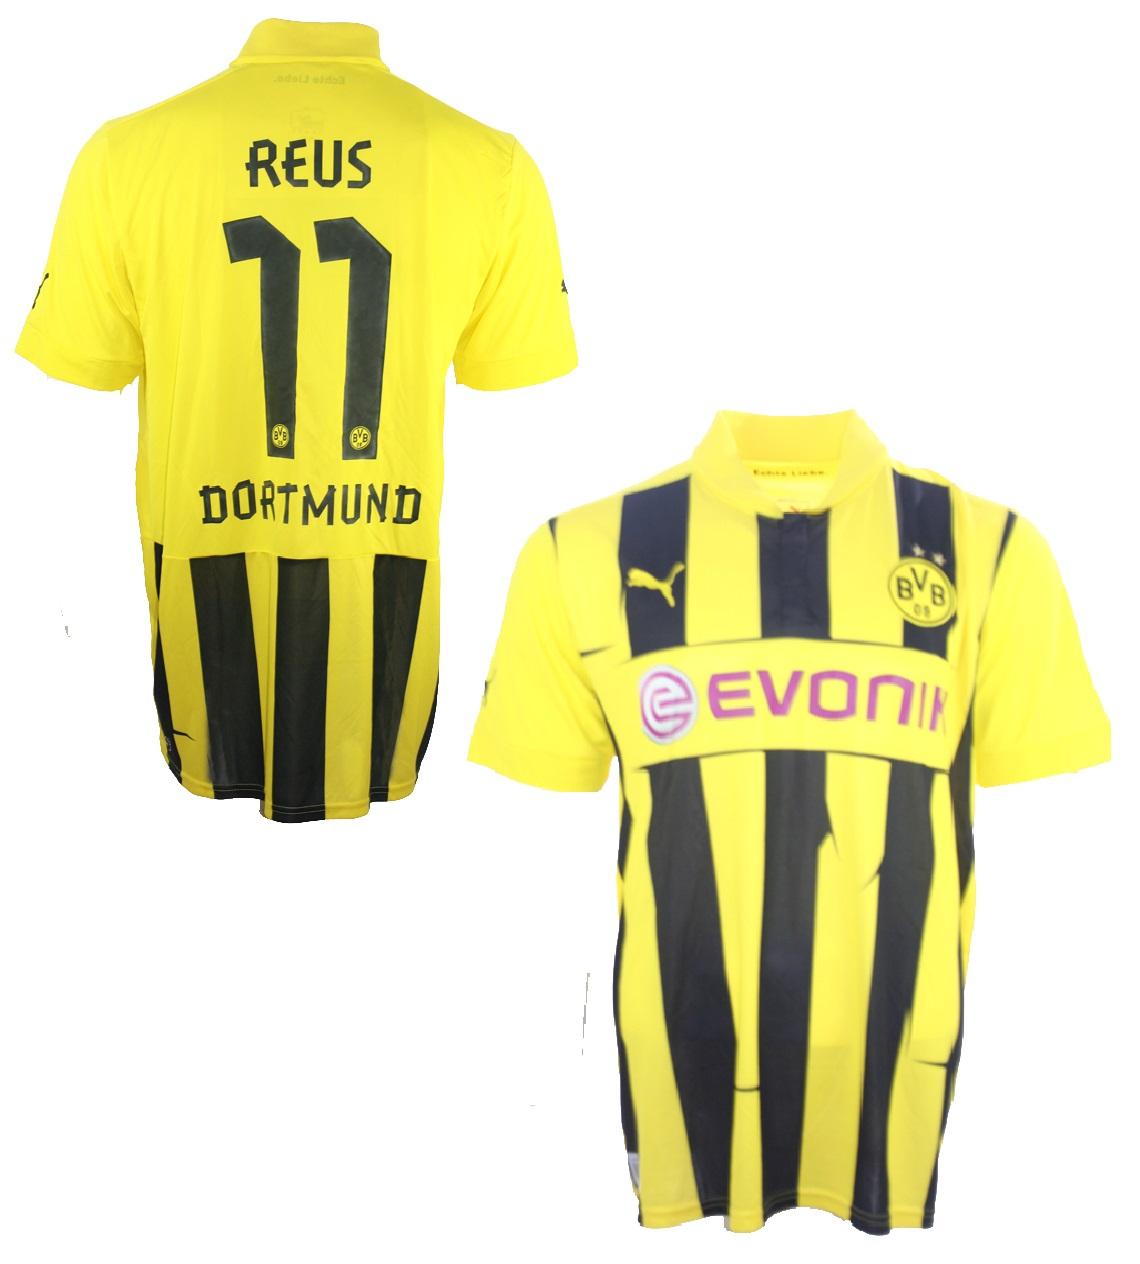 separation shoes 0152f 6271f Puma Borussia Dortmund Trikot 11 Marco Reus 2012/13 CL ...